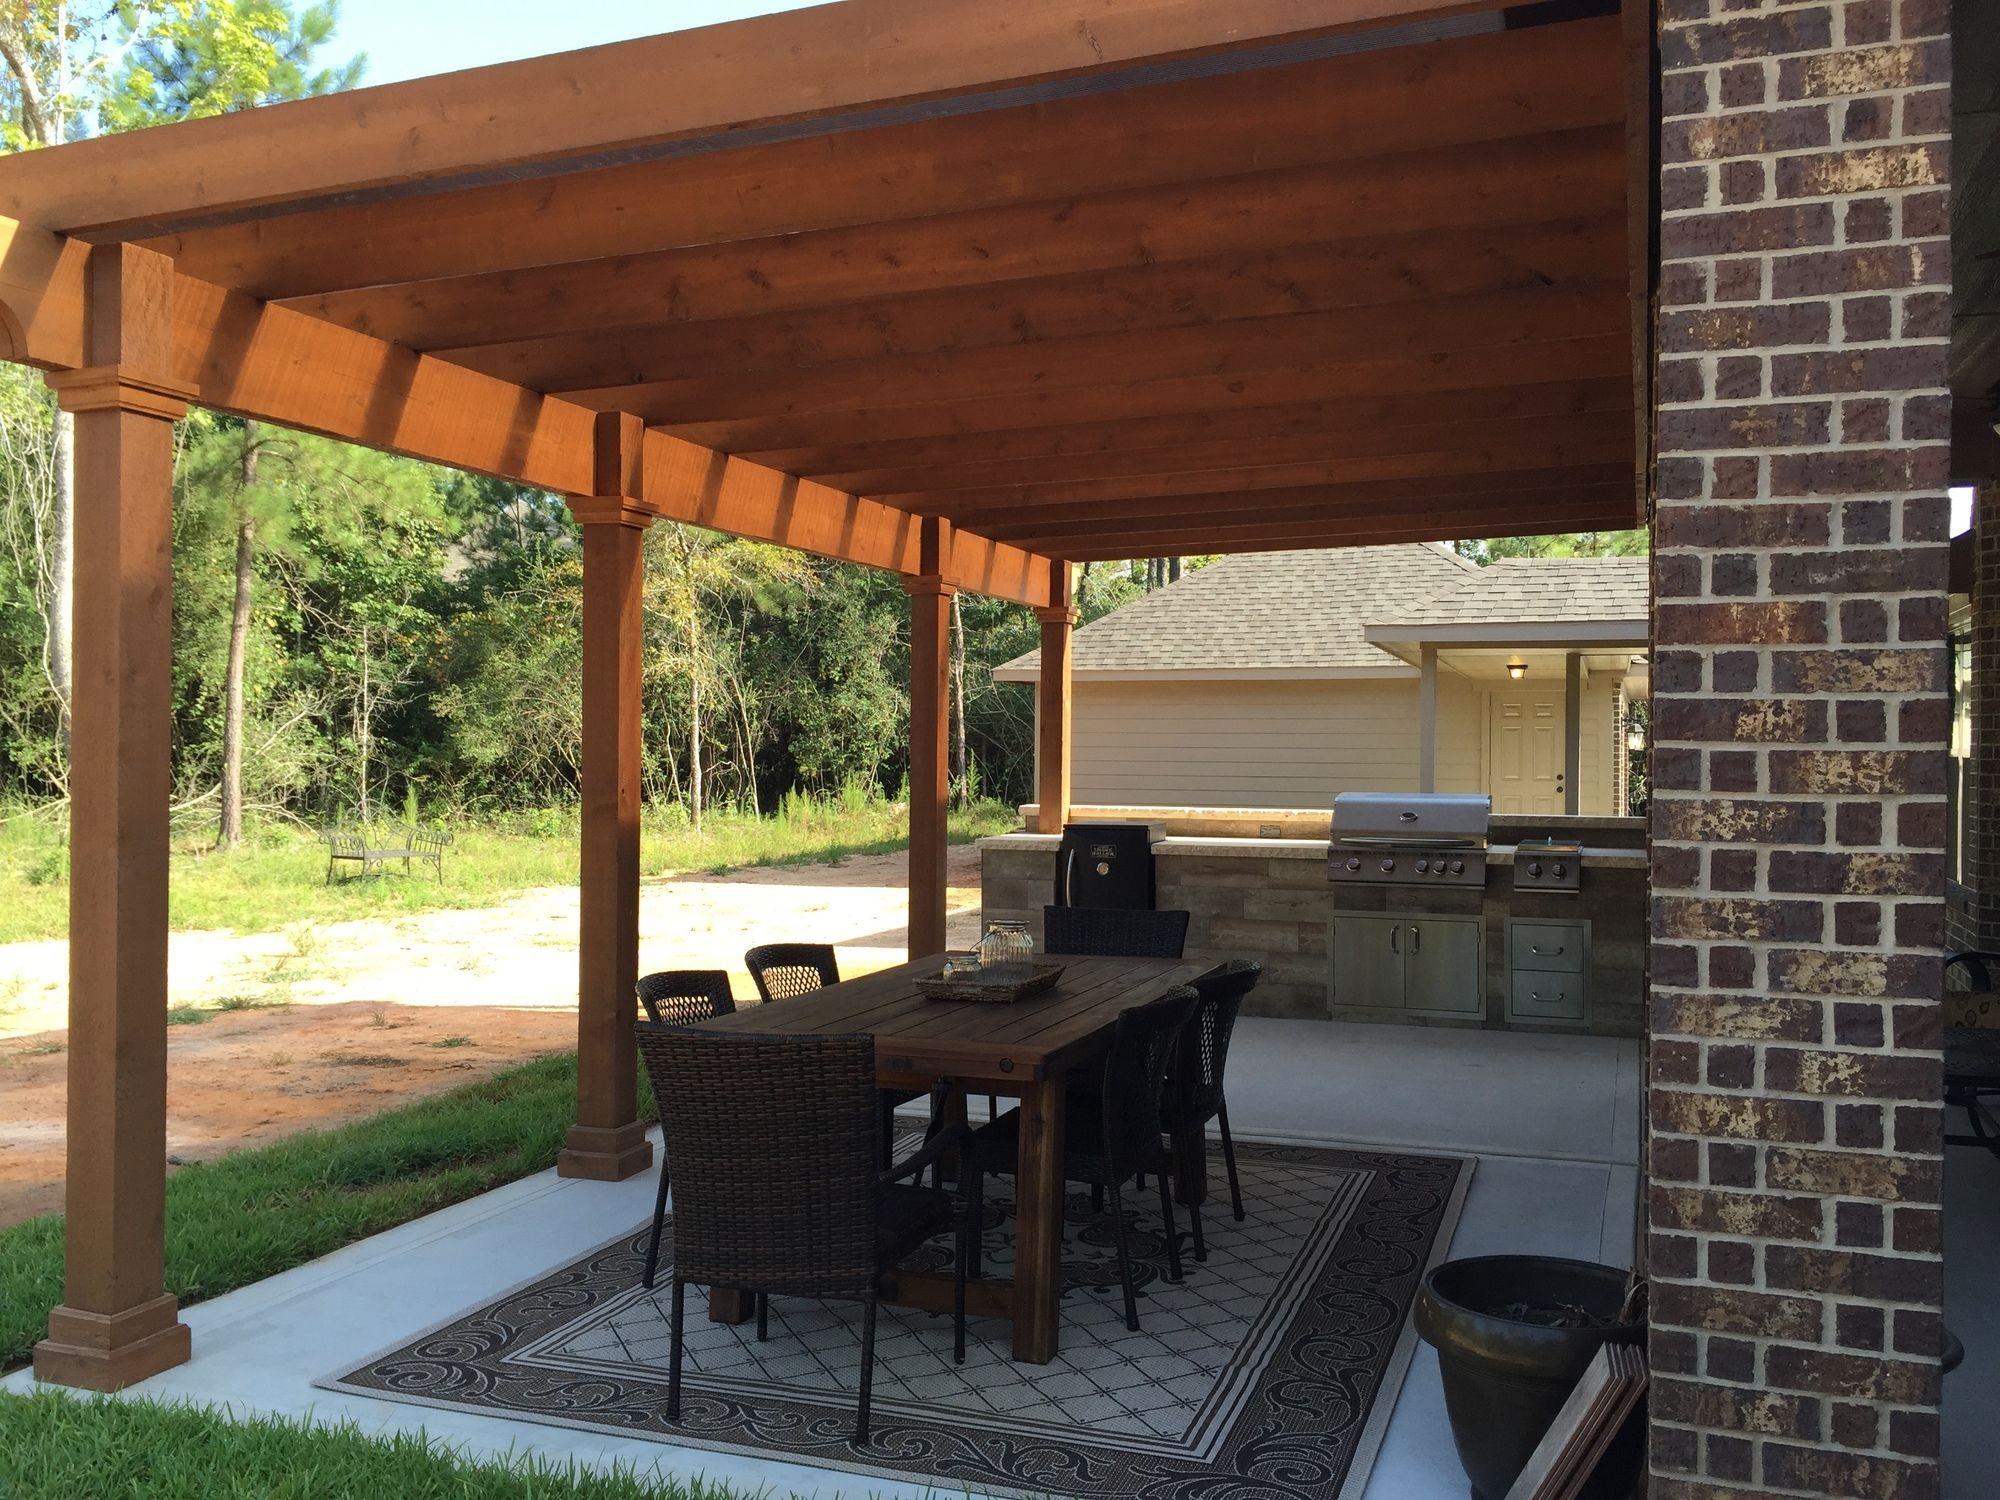 Pergolas & Gazebos - Primo Outdoor Living on Primo Outdoor Living  id=76280